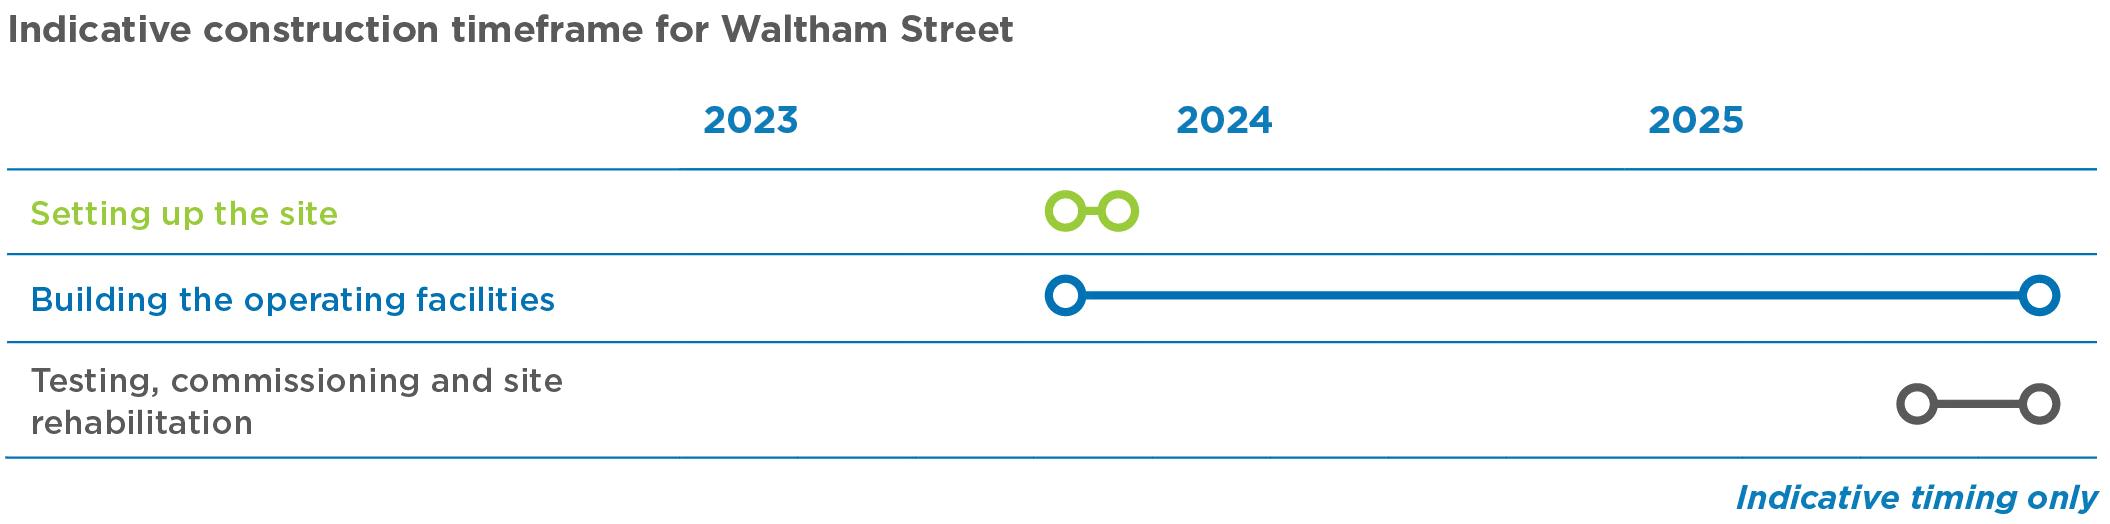 Waltham Street construction site timeline